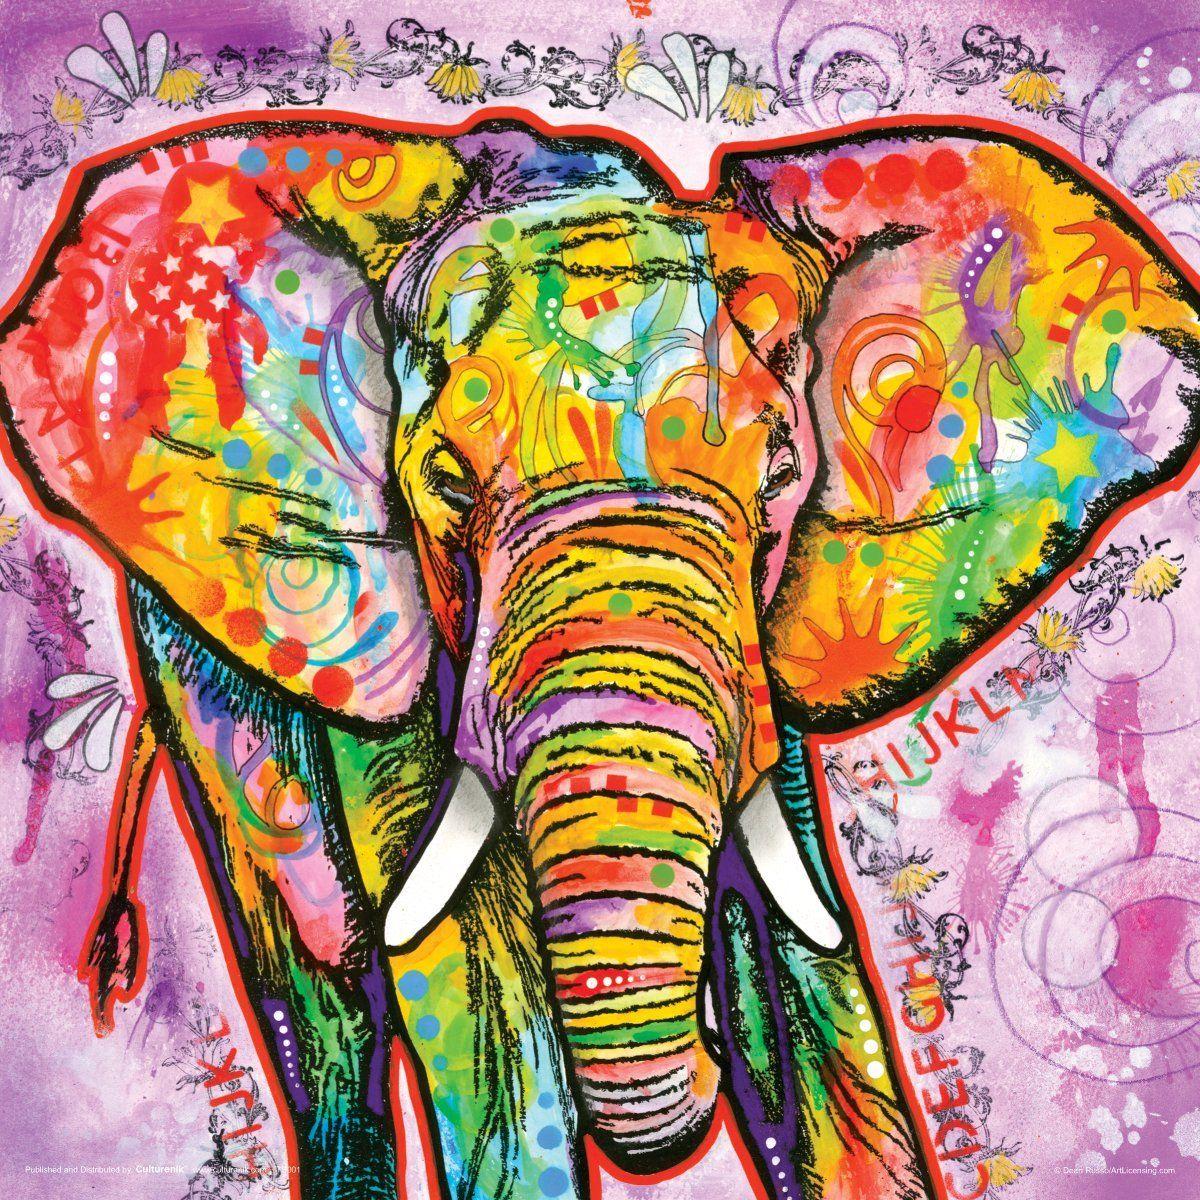 amazoncom dean russo elephant modern animal decorative art poster print - Decorative Art